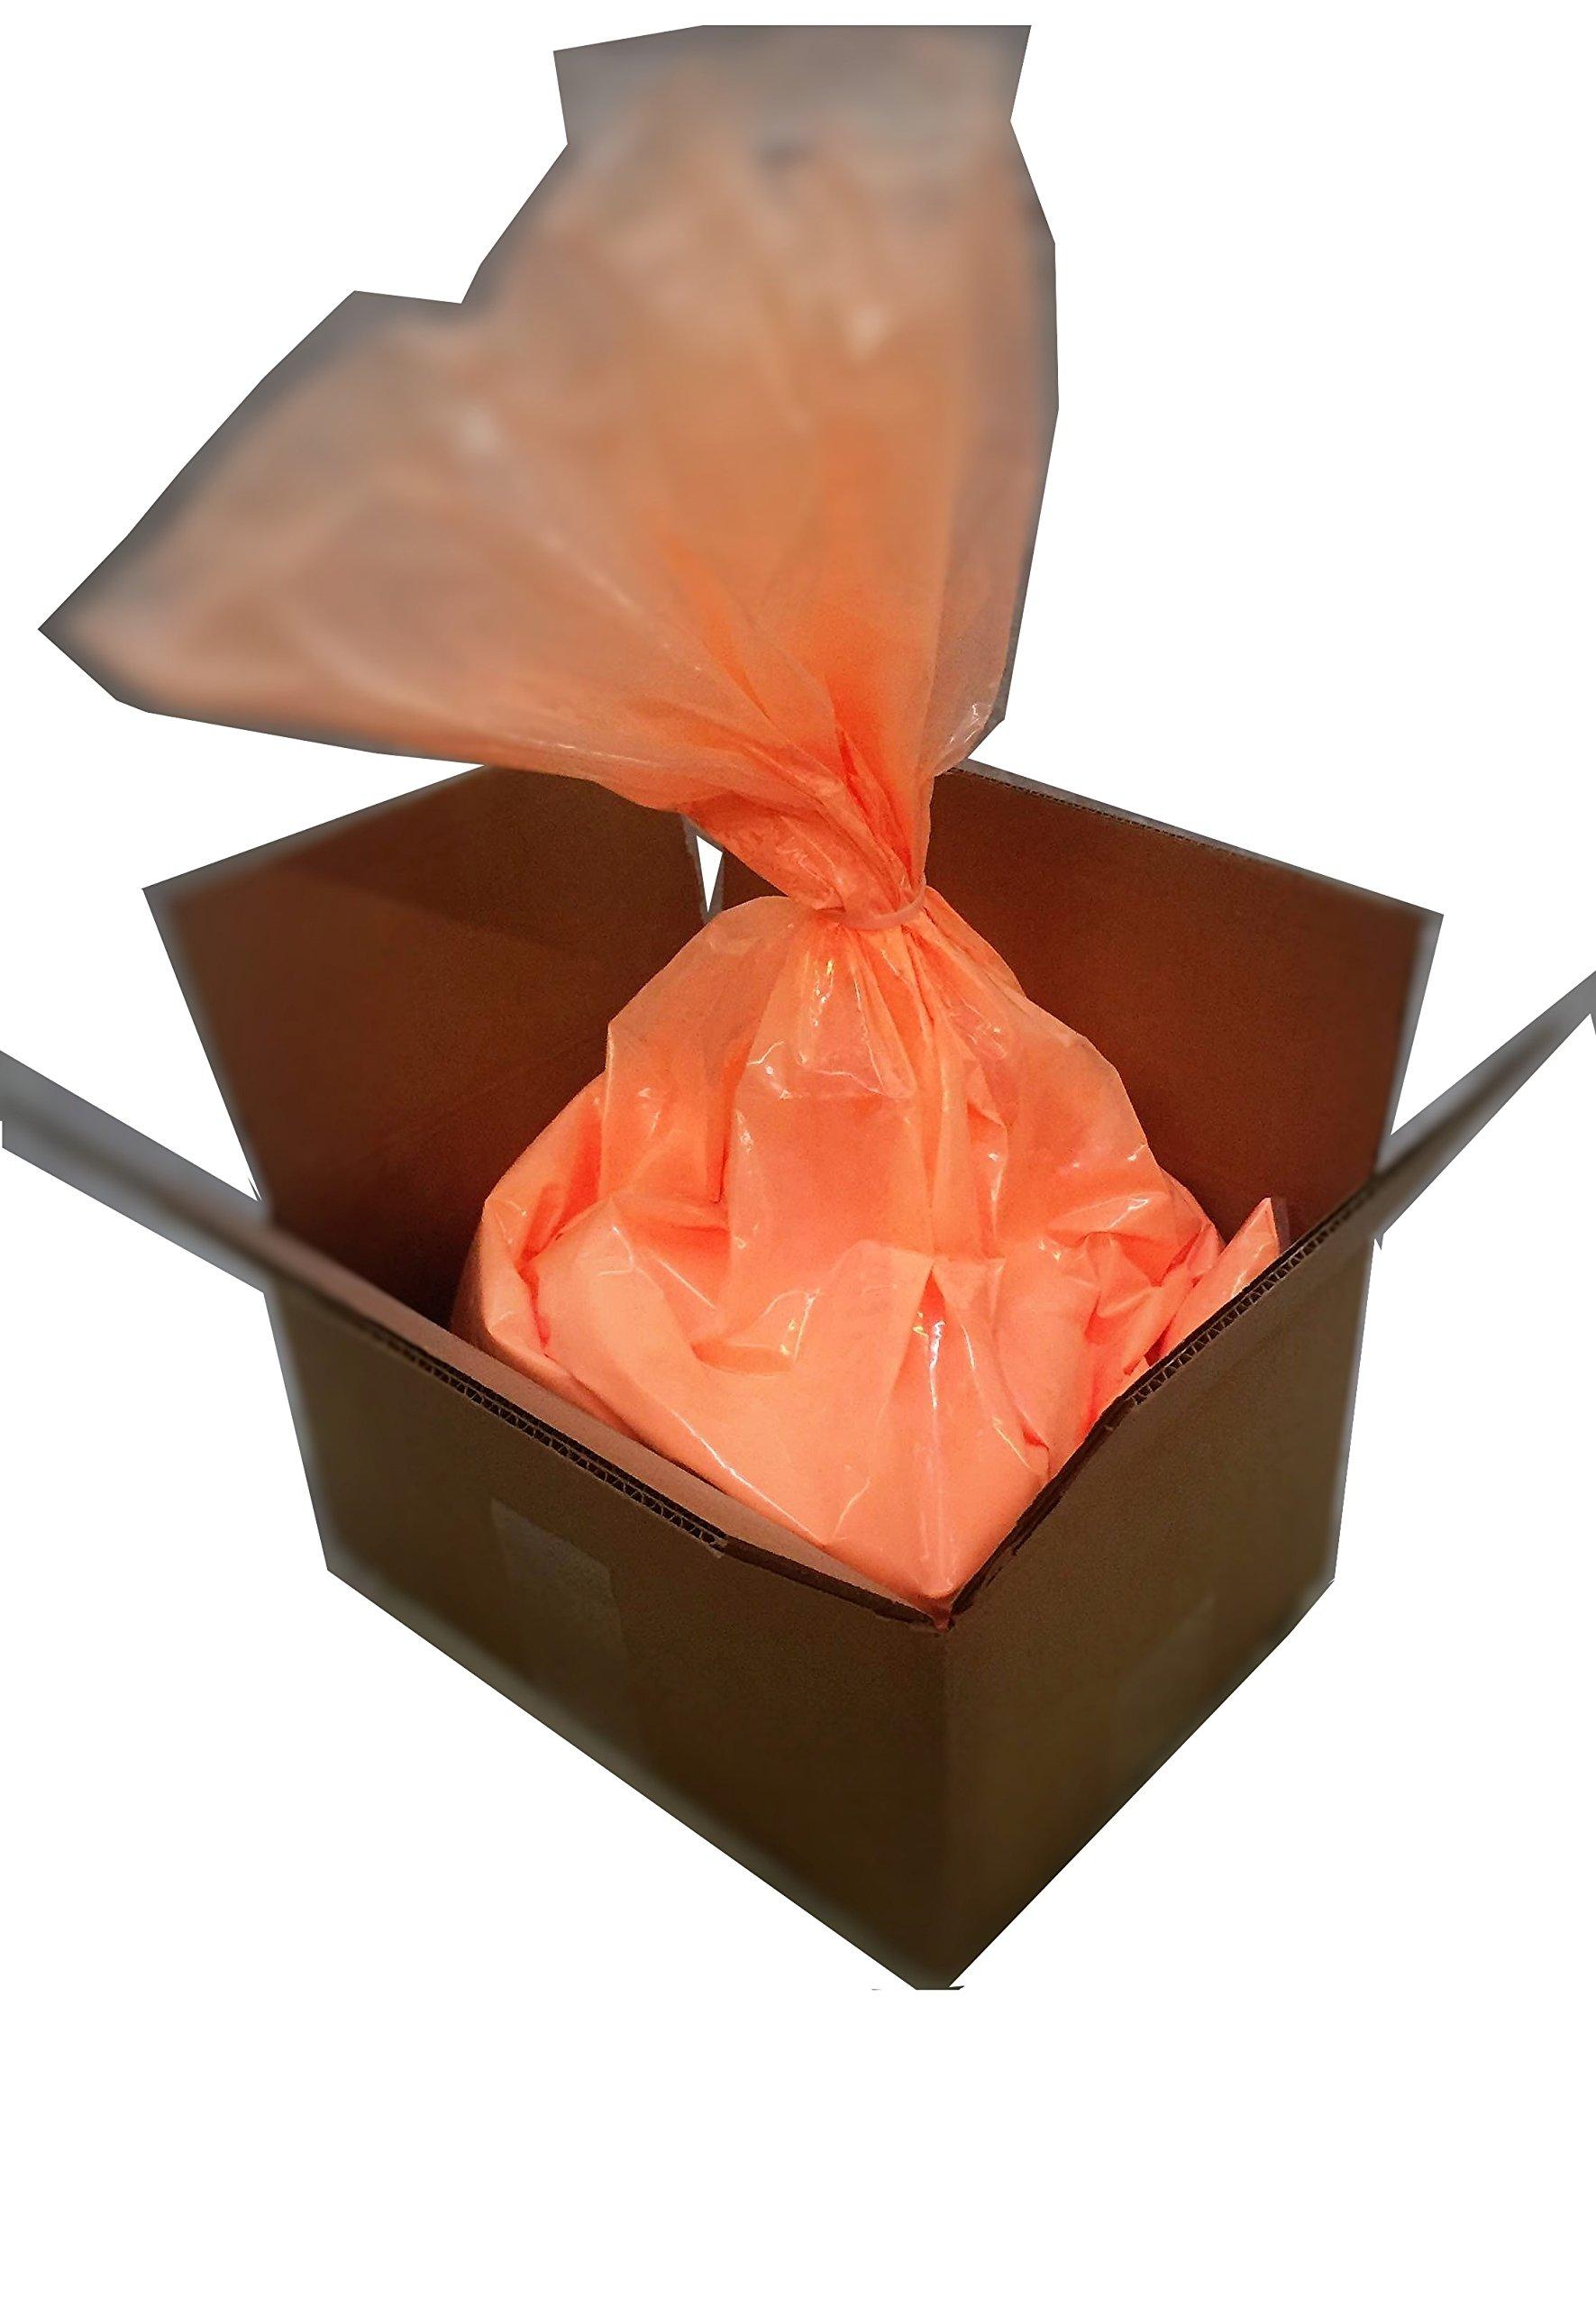 Holi Color Powder   Celebration Powder   Neon/Afterdark Orange   Bulk 25 lbs.